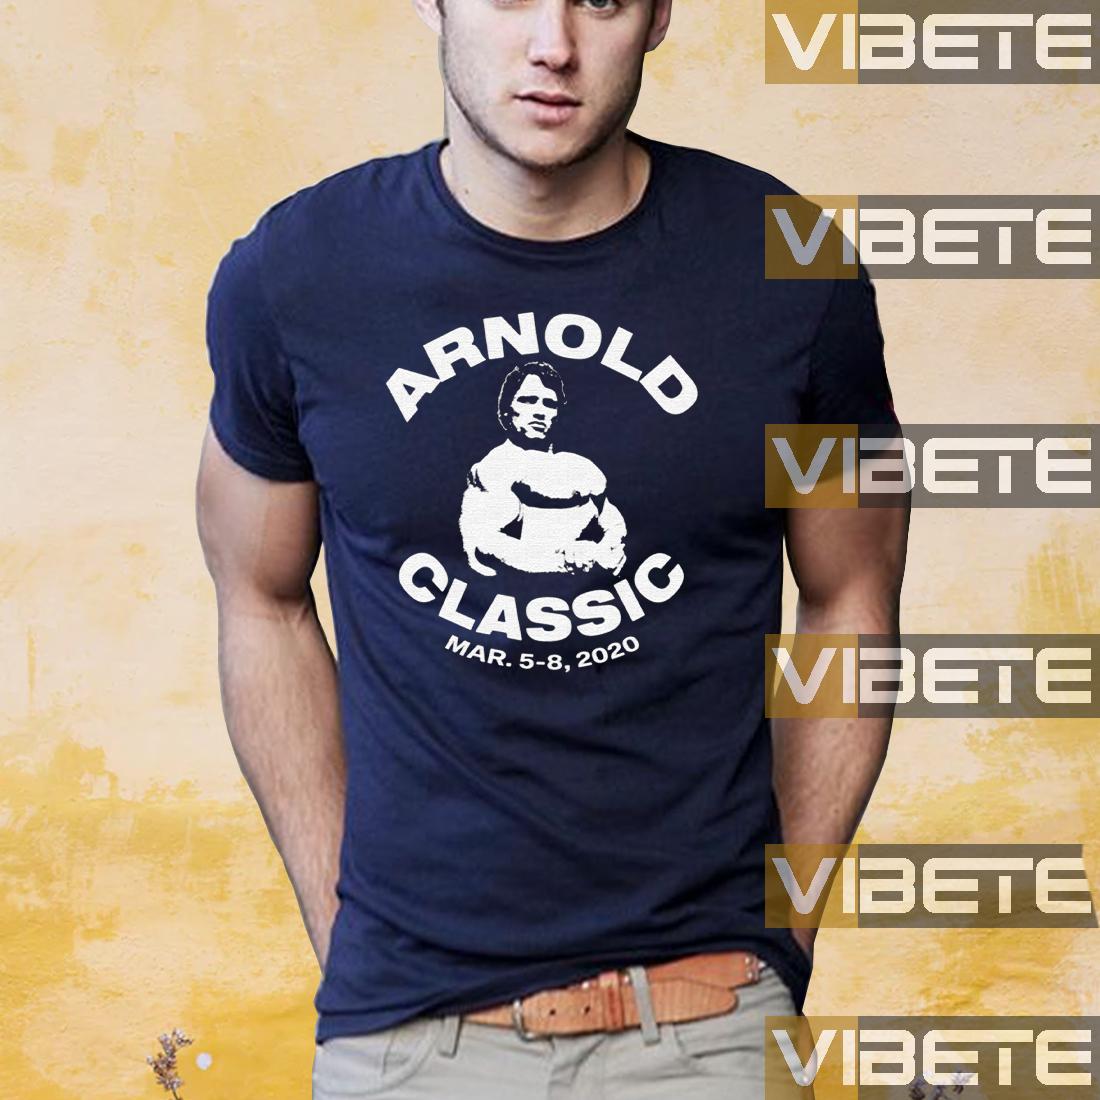 Arnold Classic 2020 T-Shirt